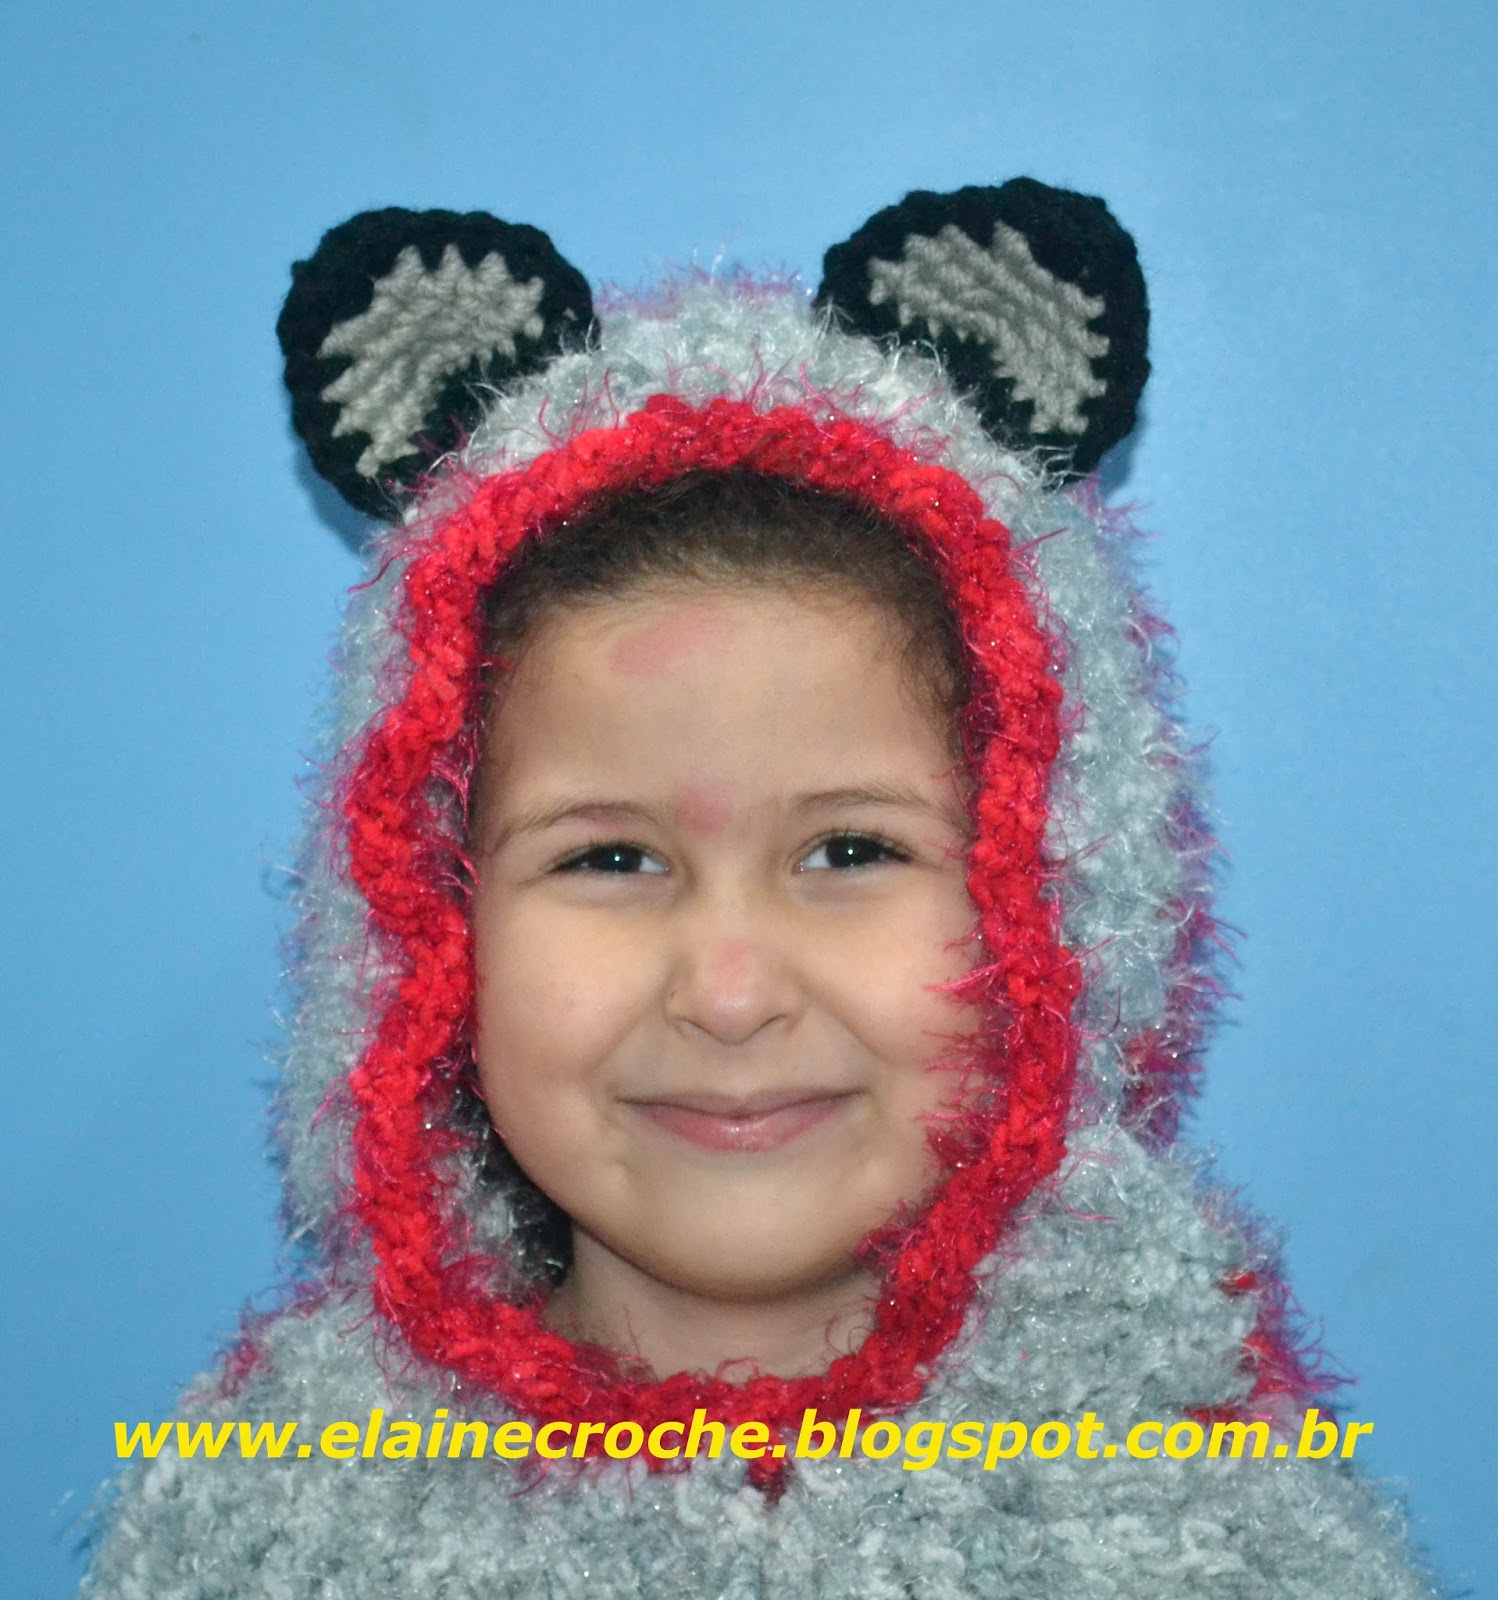 Touca Gola Gatinha em Crochê - Infantil ou Adulto - Vídeo Aula Crochê abe1baa4116